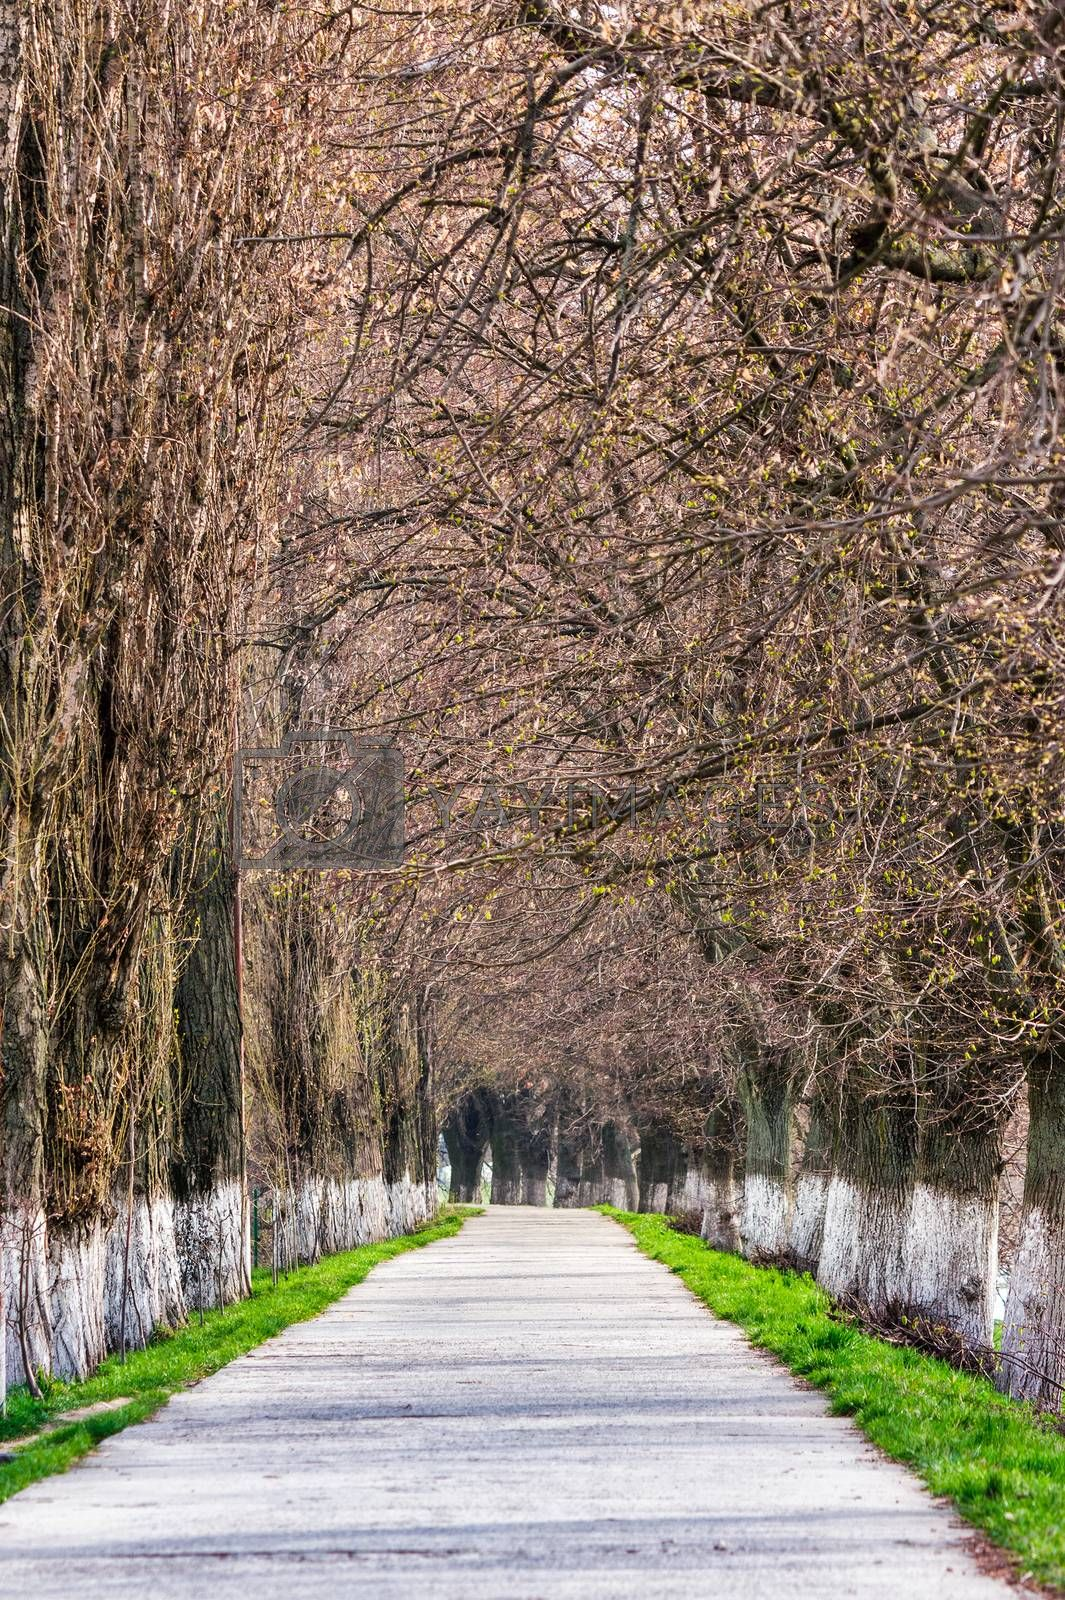 longest european linden alley in springtime by Pellinni